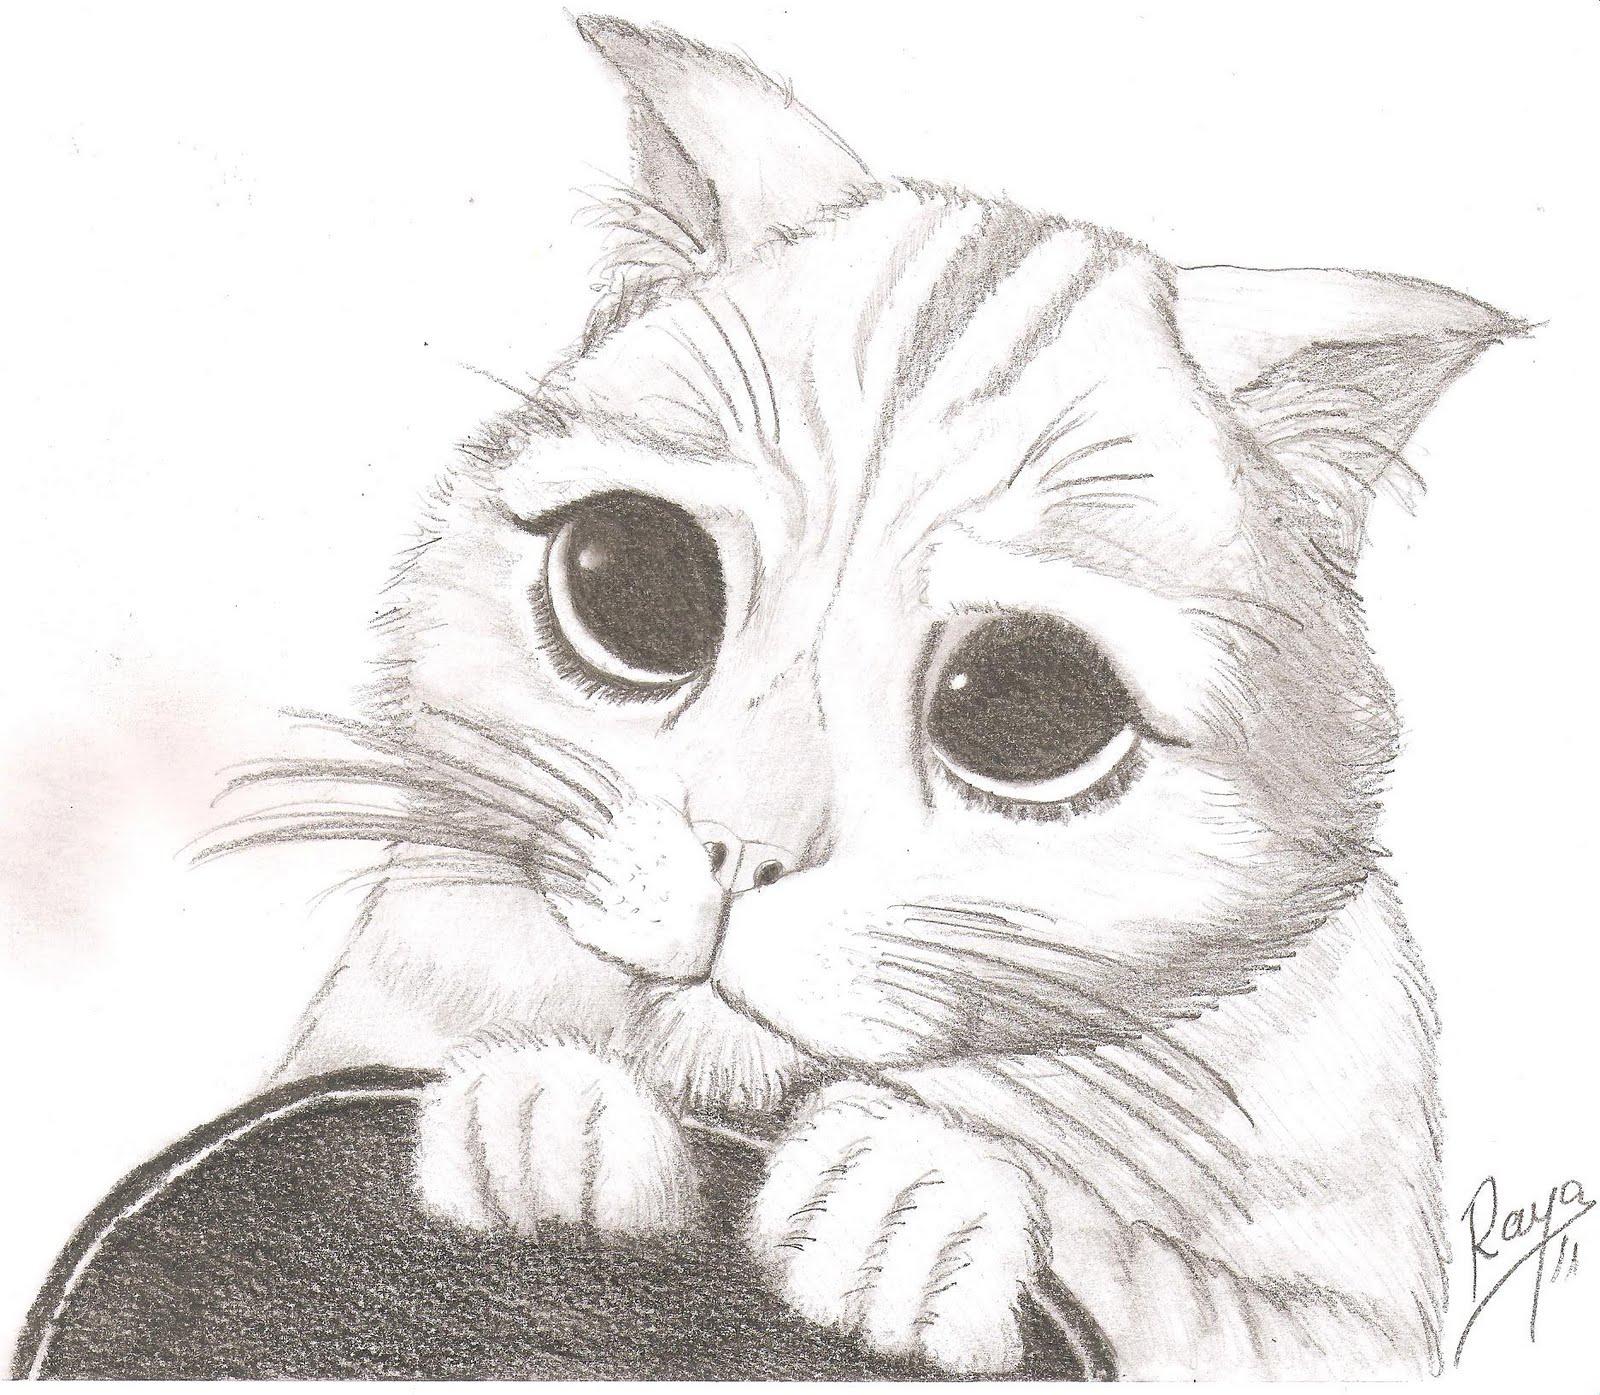 gato con botas dibujo a lapiz b5b74ee3f44b258fec16d05089c62553